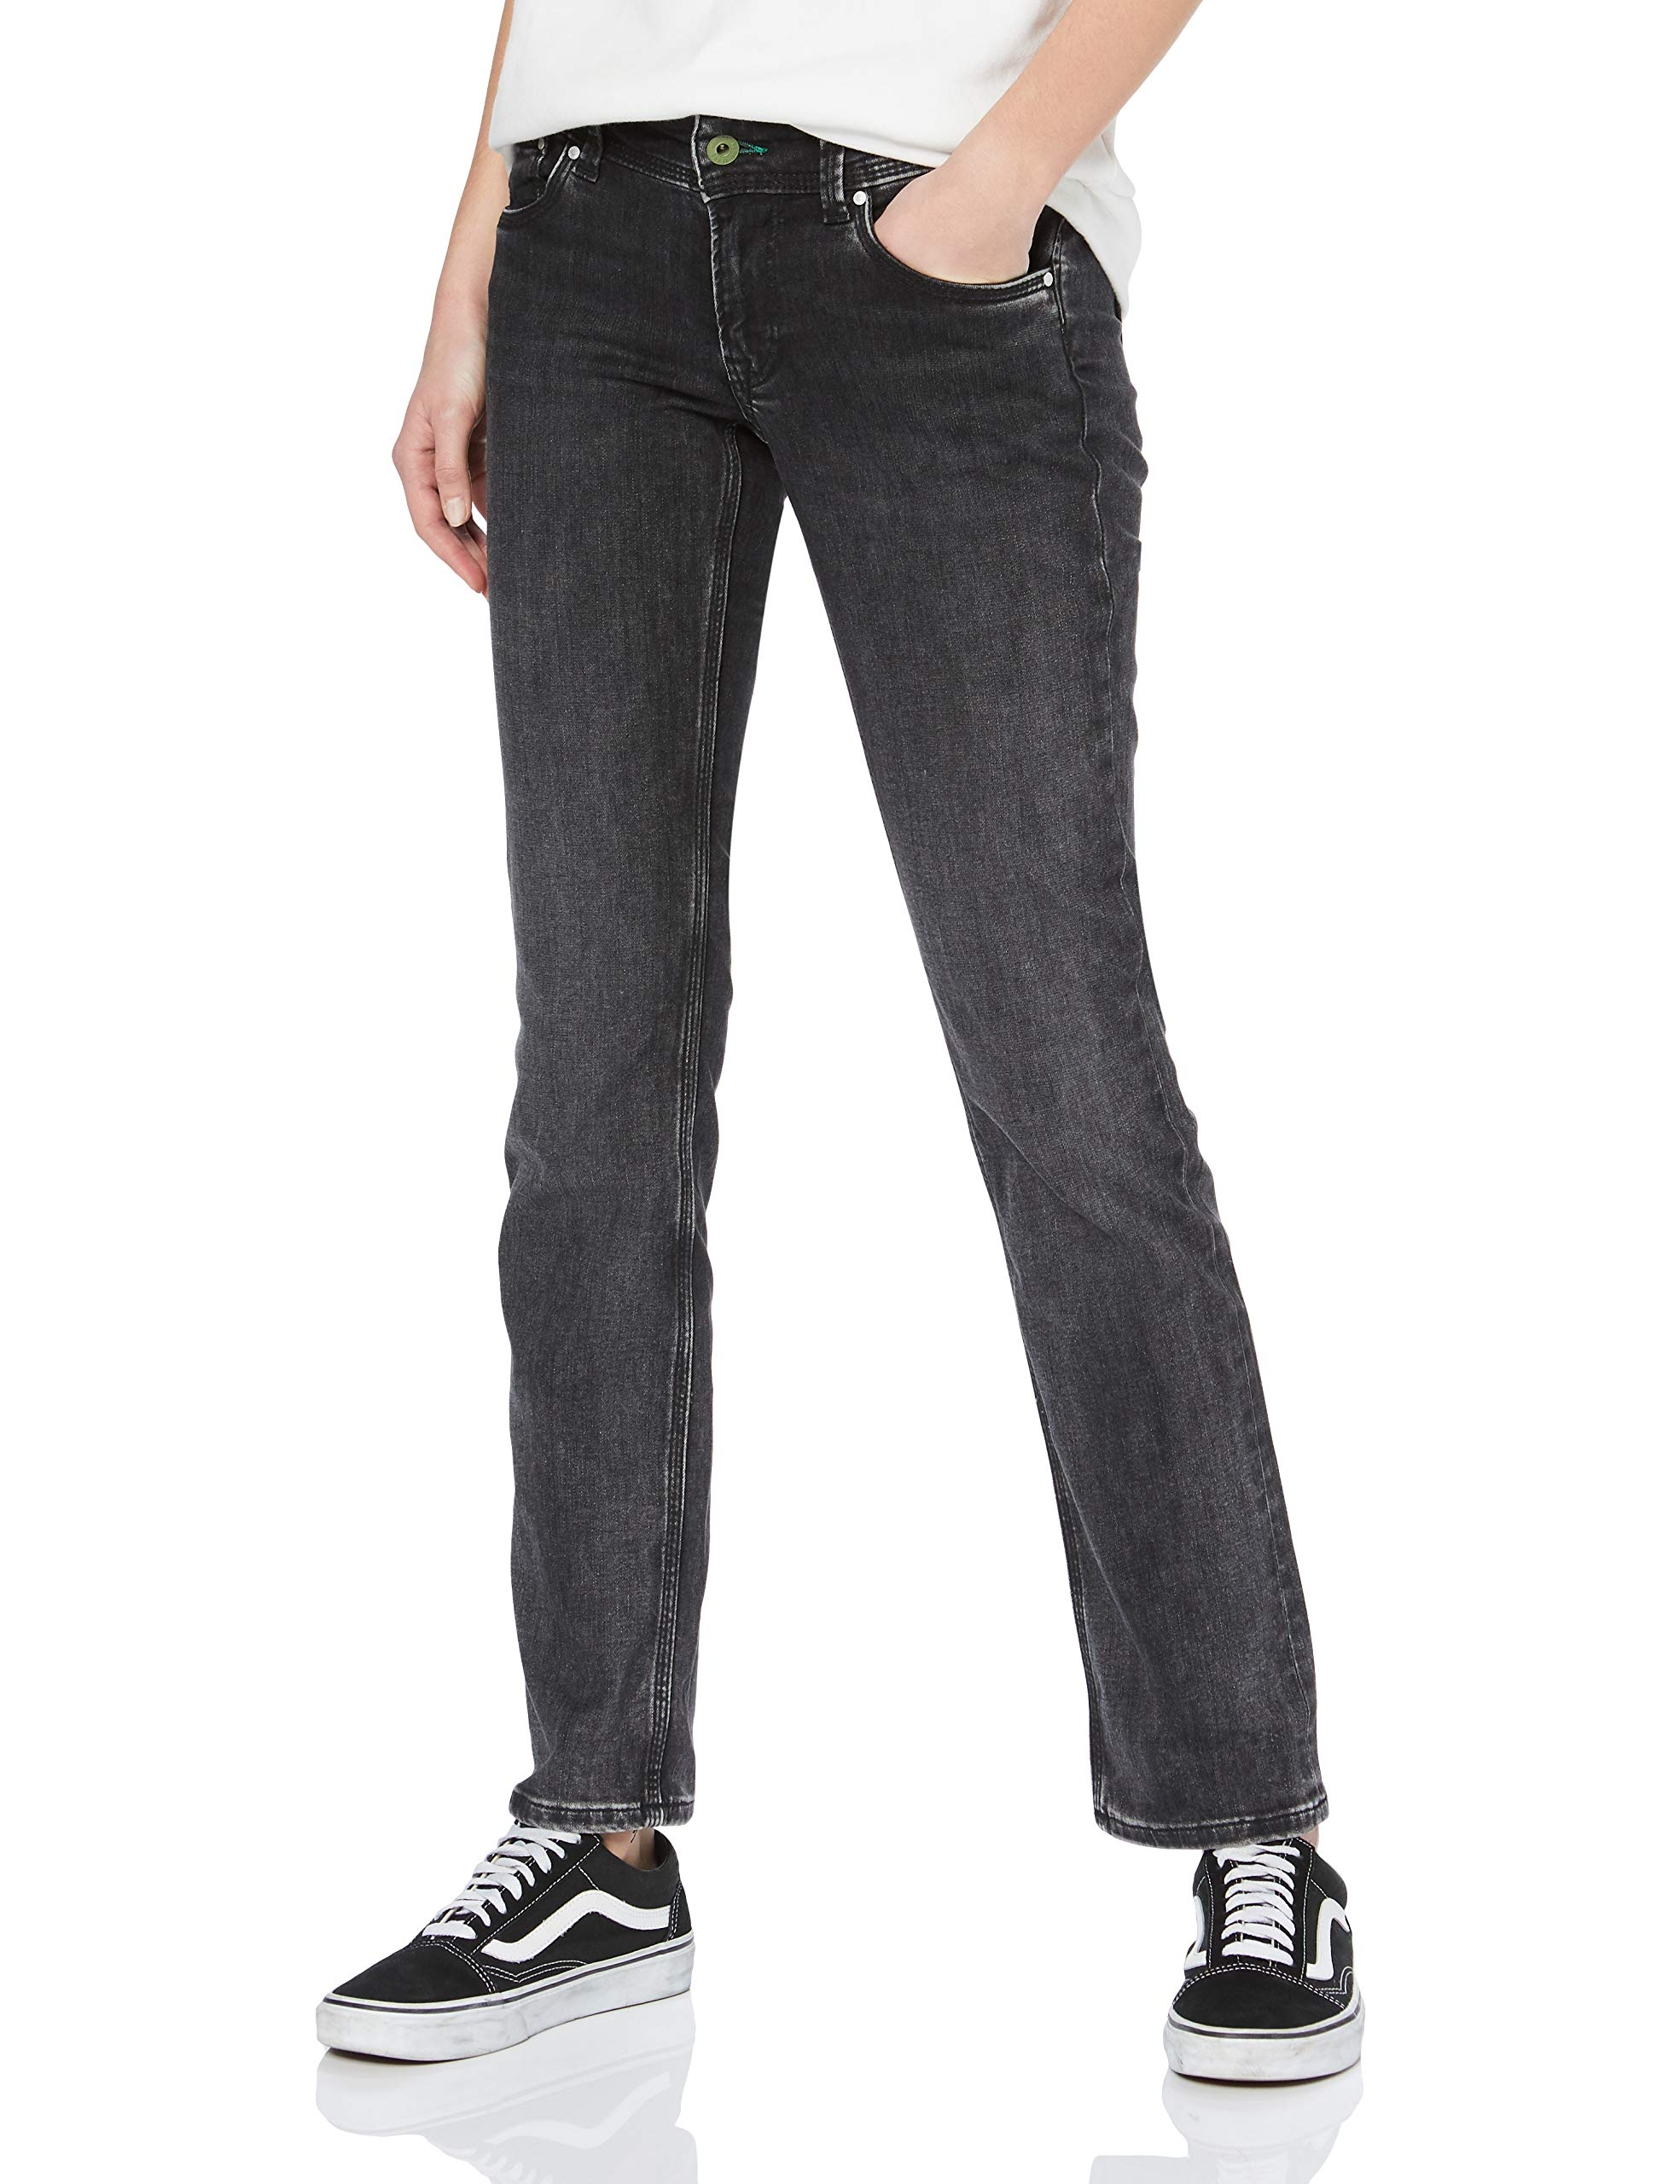 Jeans Wz7taille Fabricant Wiser DroitNoirblack l34Femme Wash Pepe Saturn Denim w24 Jean deQCxBrWoE